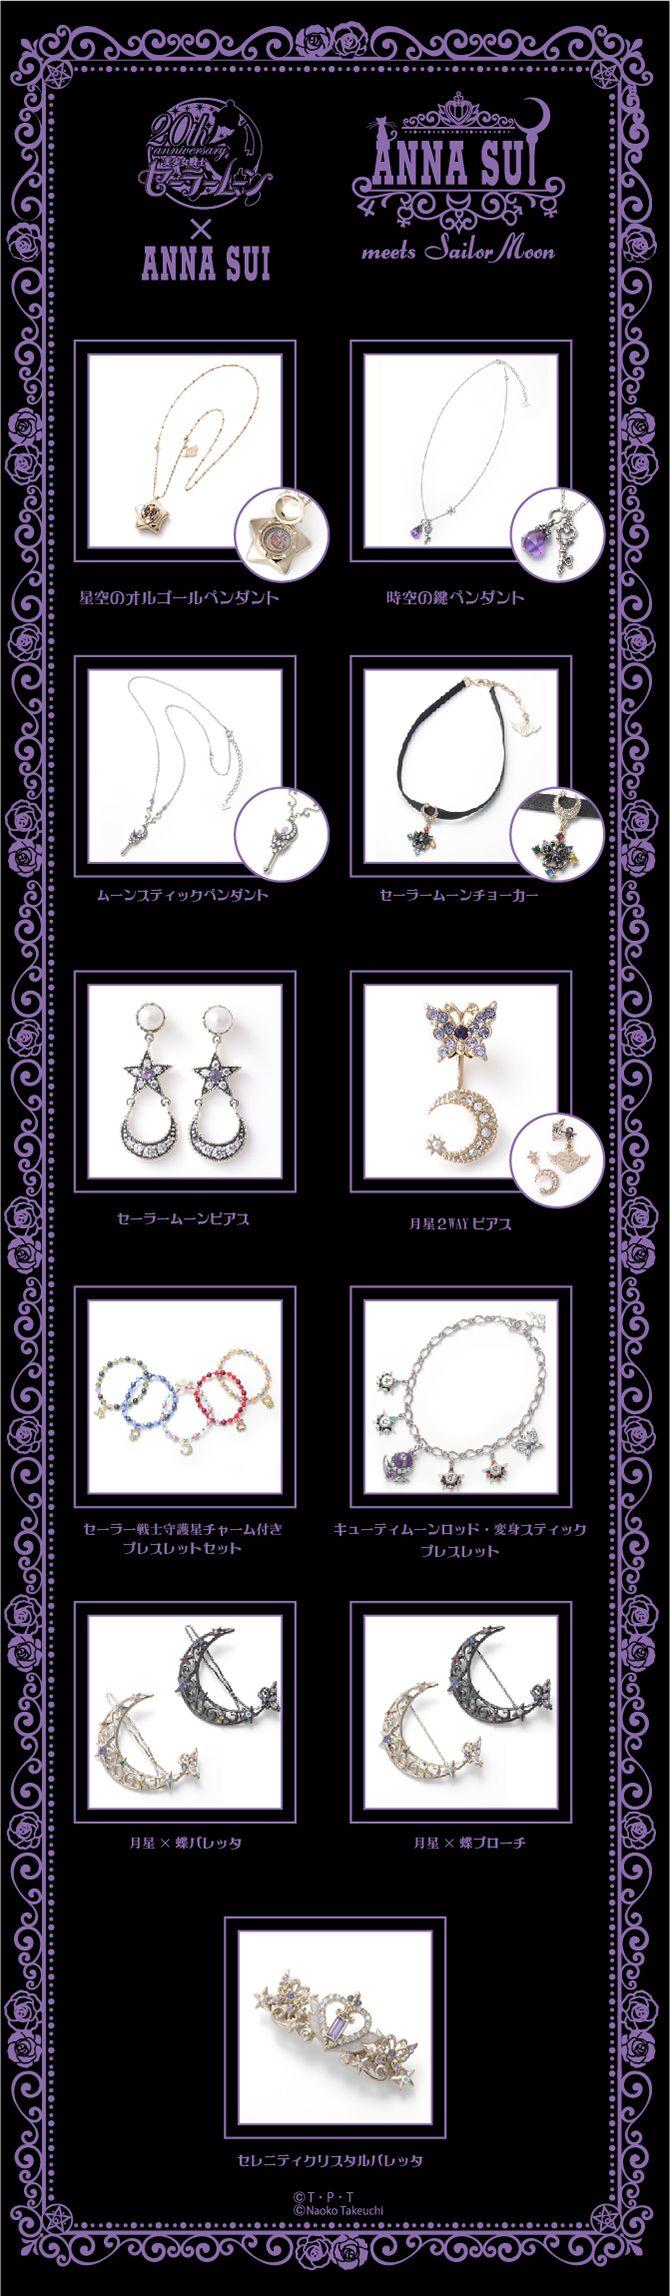 Sailor Moon × ANNA SUI 2nd collaboration